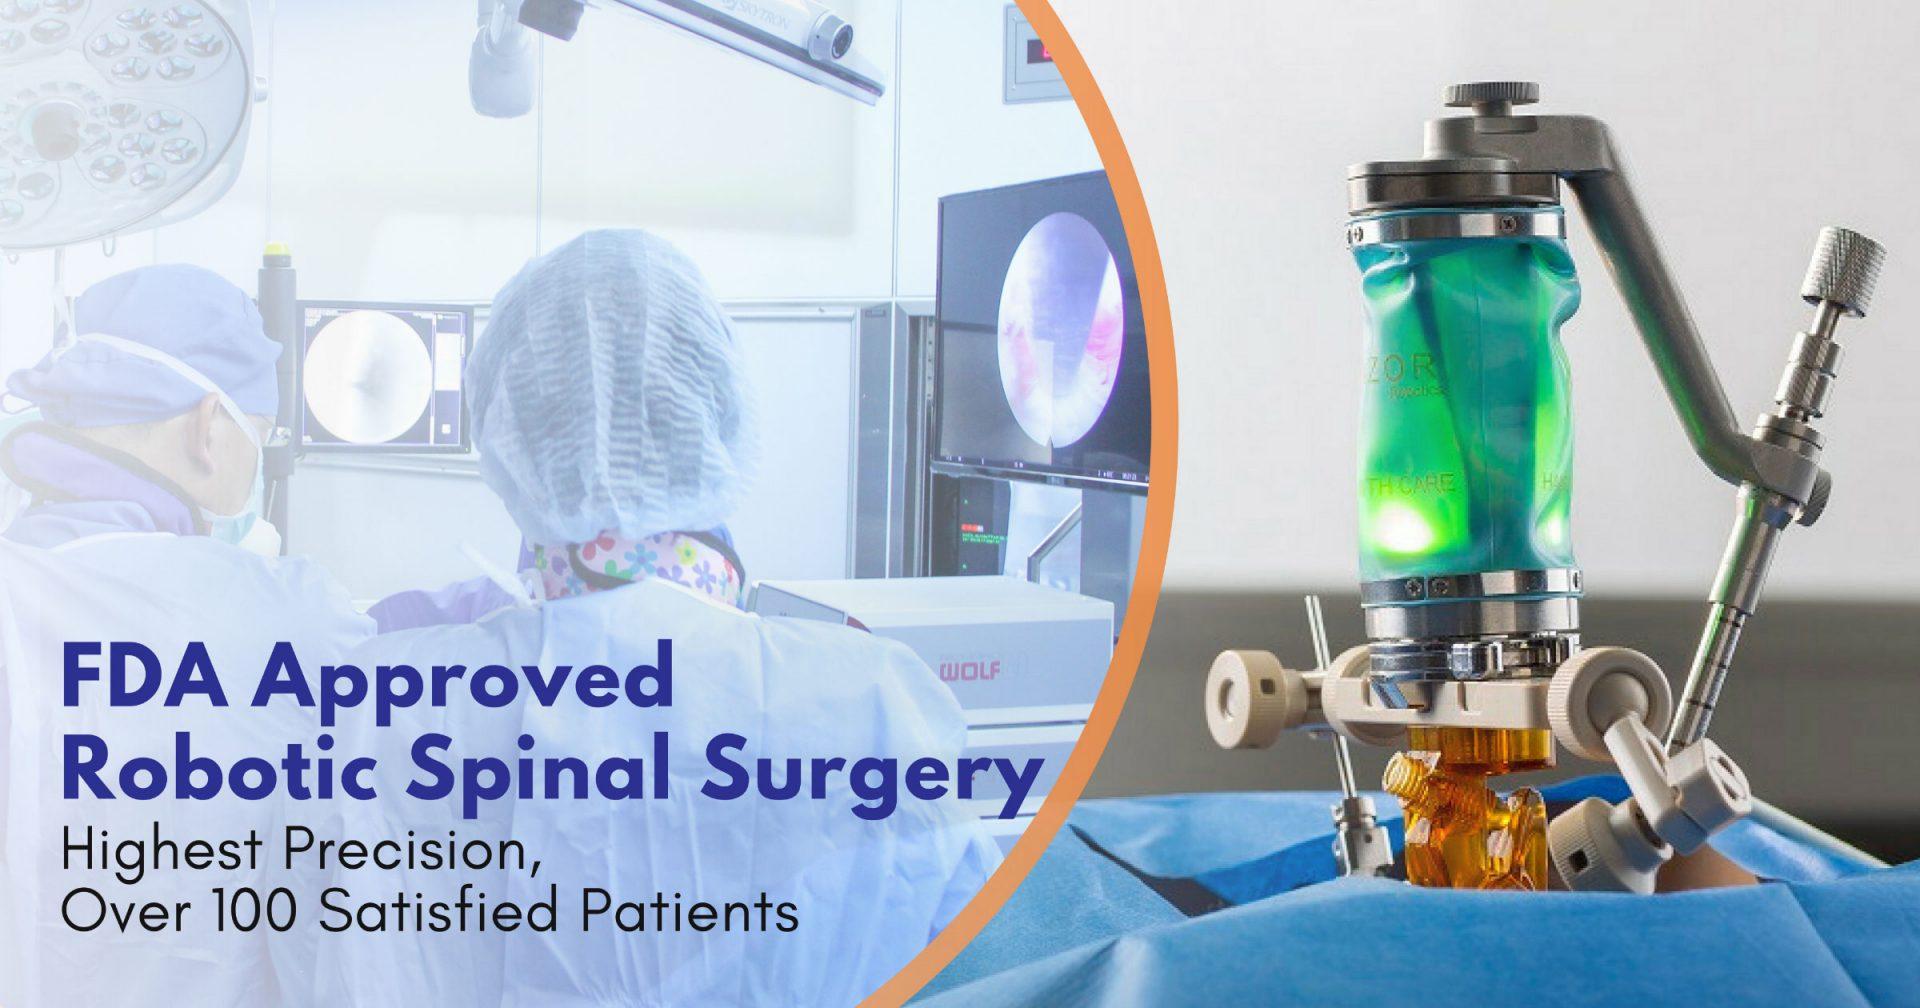 Robotic_Spinal-_Surgery_Vejthani_Hospital_Spine_Center